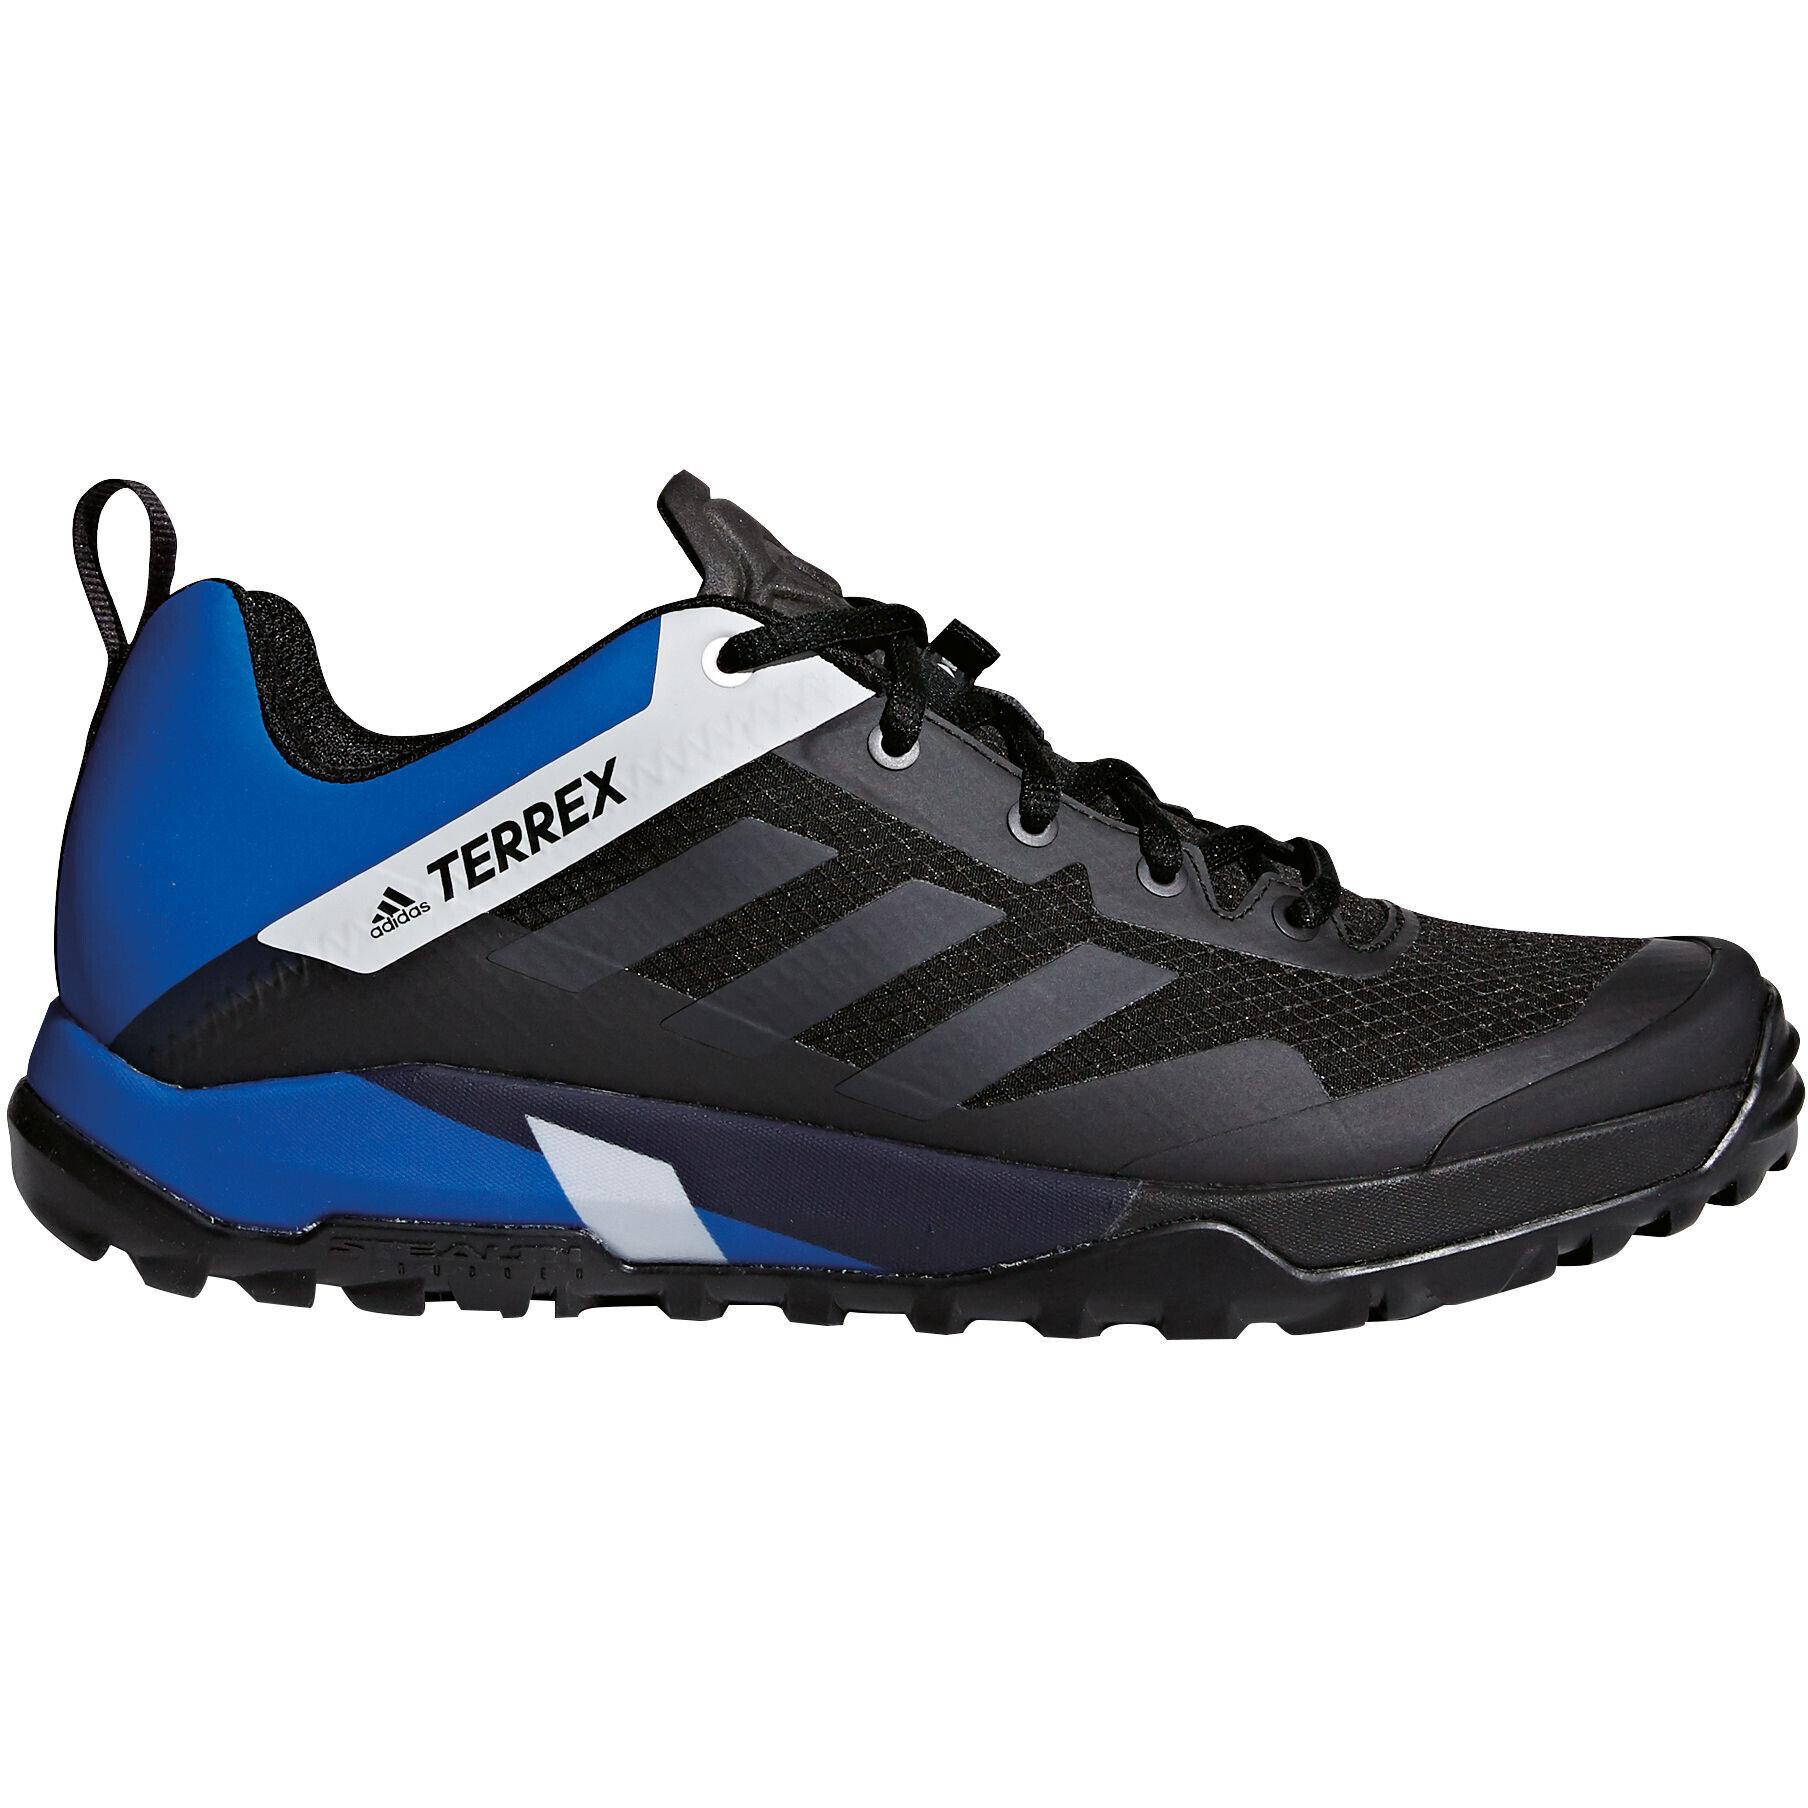 adidas TERREX Trail Cross Sl Schuhe Herren core blackcarbonblue beauty